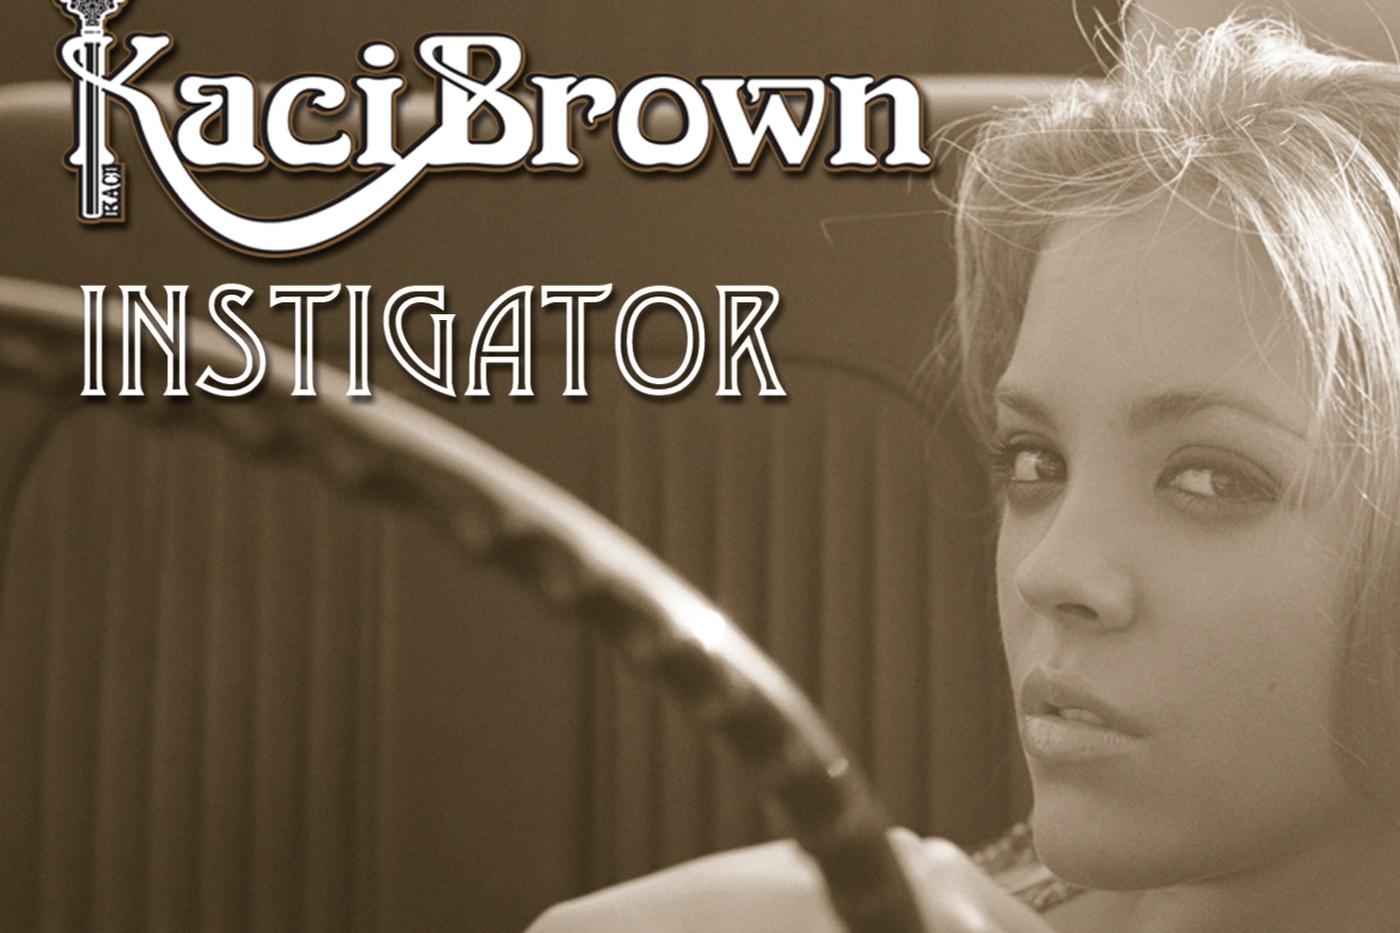 Kaci Brown - Instigator